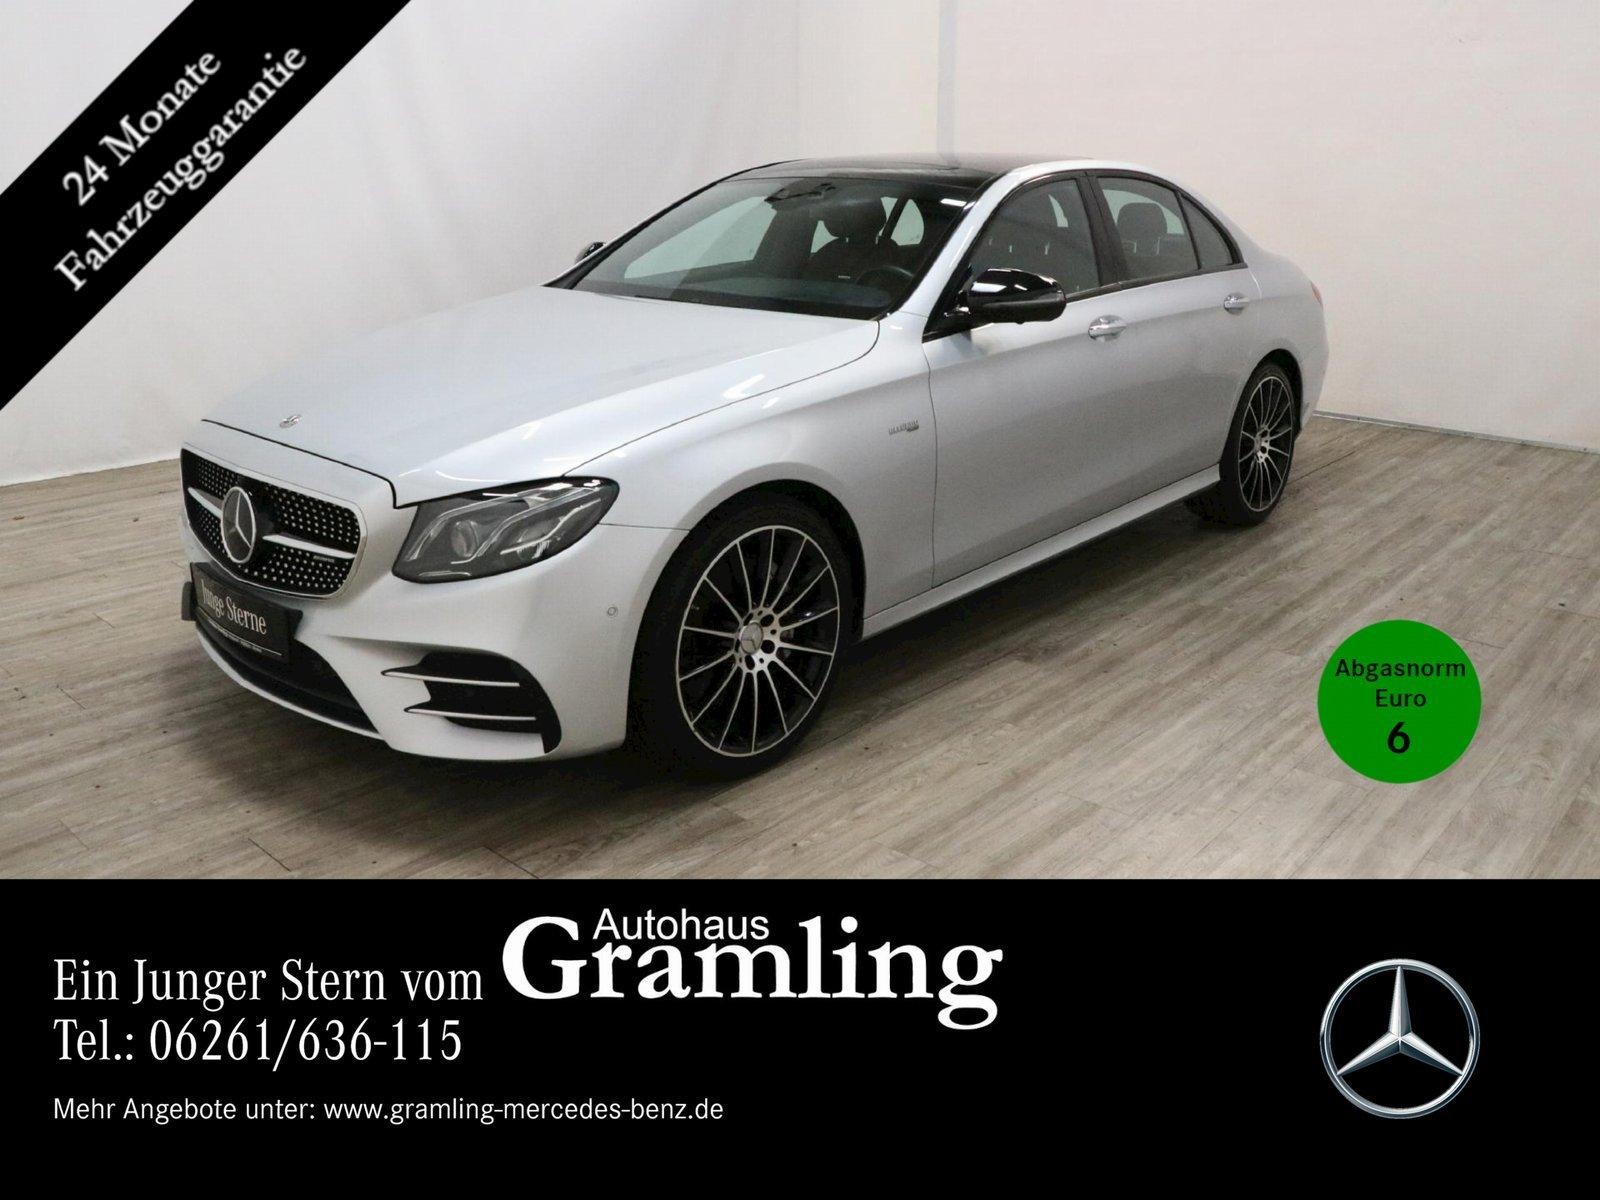 Mercedes-Benz E 43 AMG 4M MULTIBEAM*Distr*360°*HUD*Pano*Widesc, Jahr 2017, Benzin